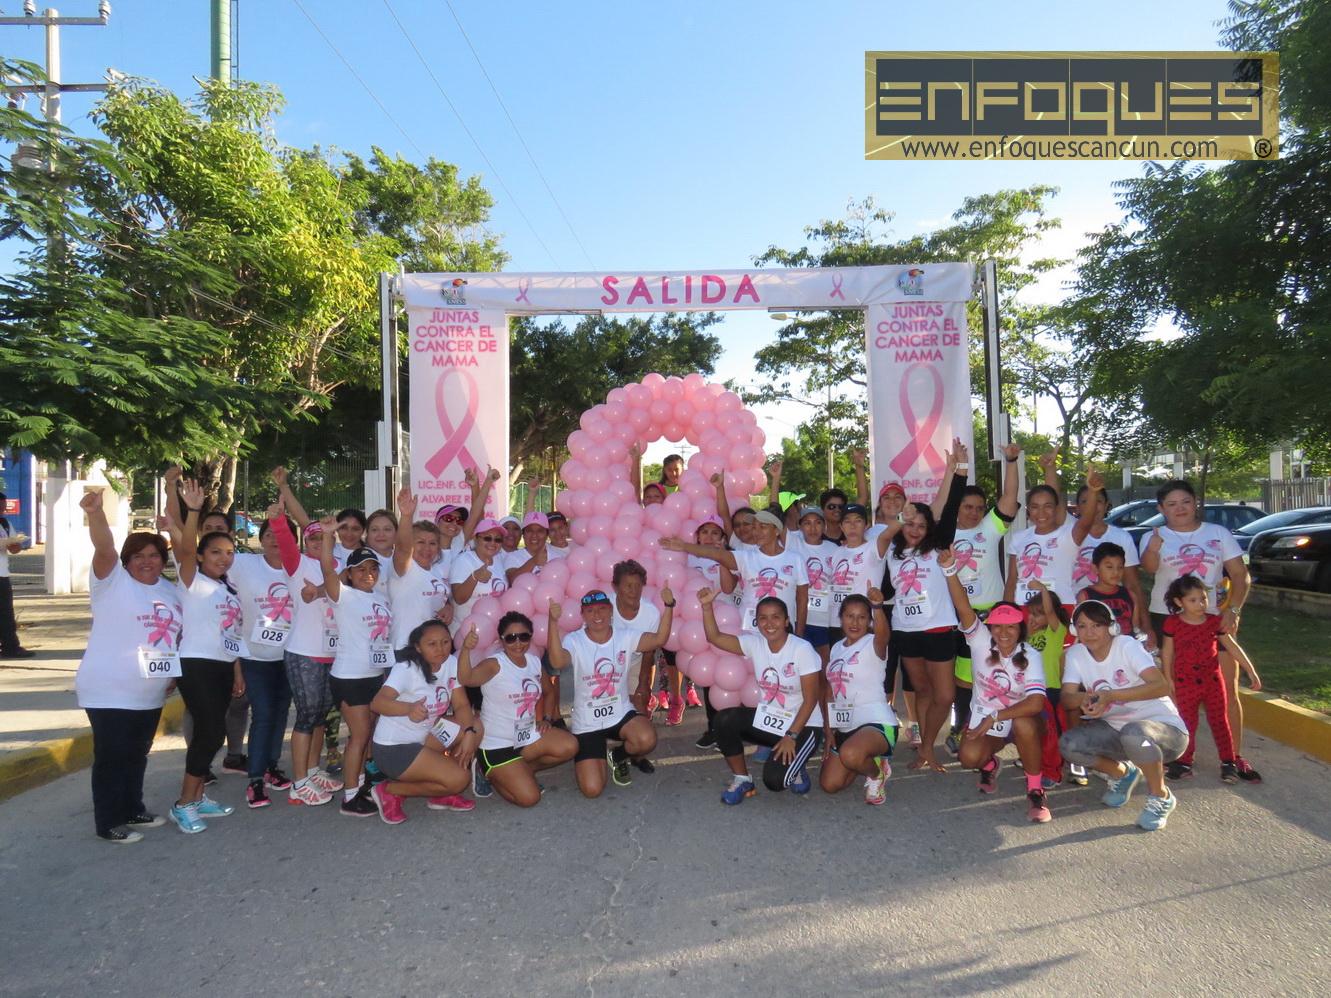 Carrera Juntas contra el Cancer de mama